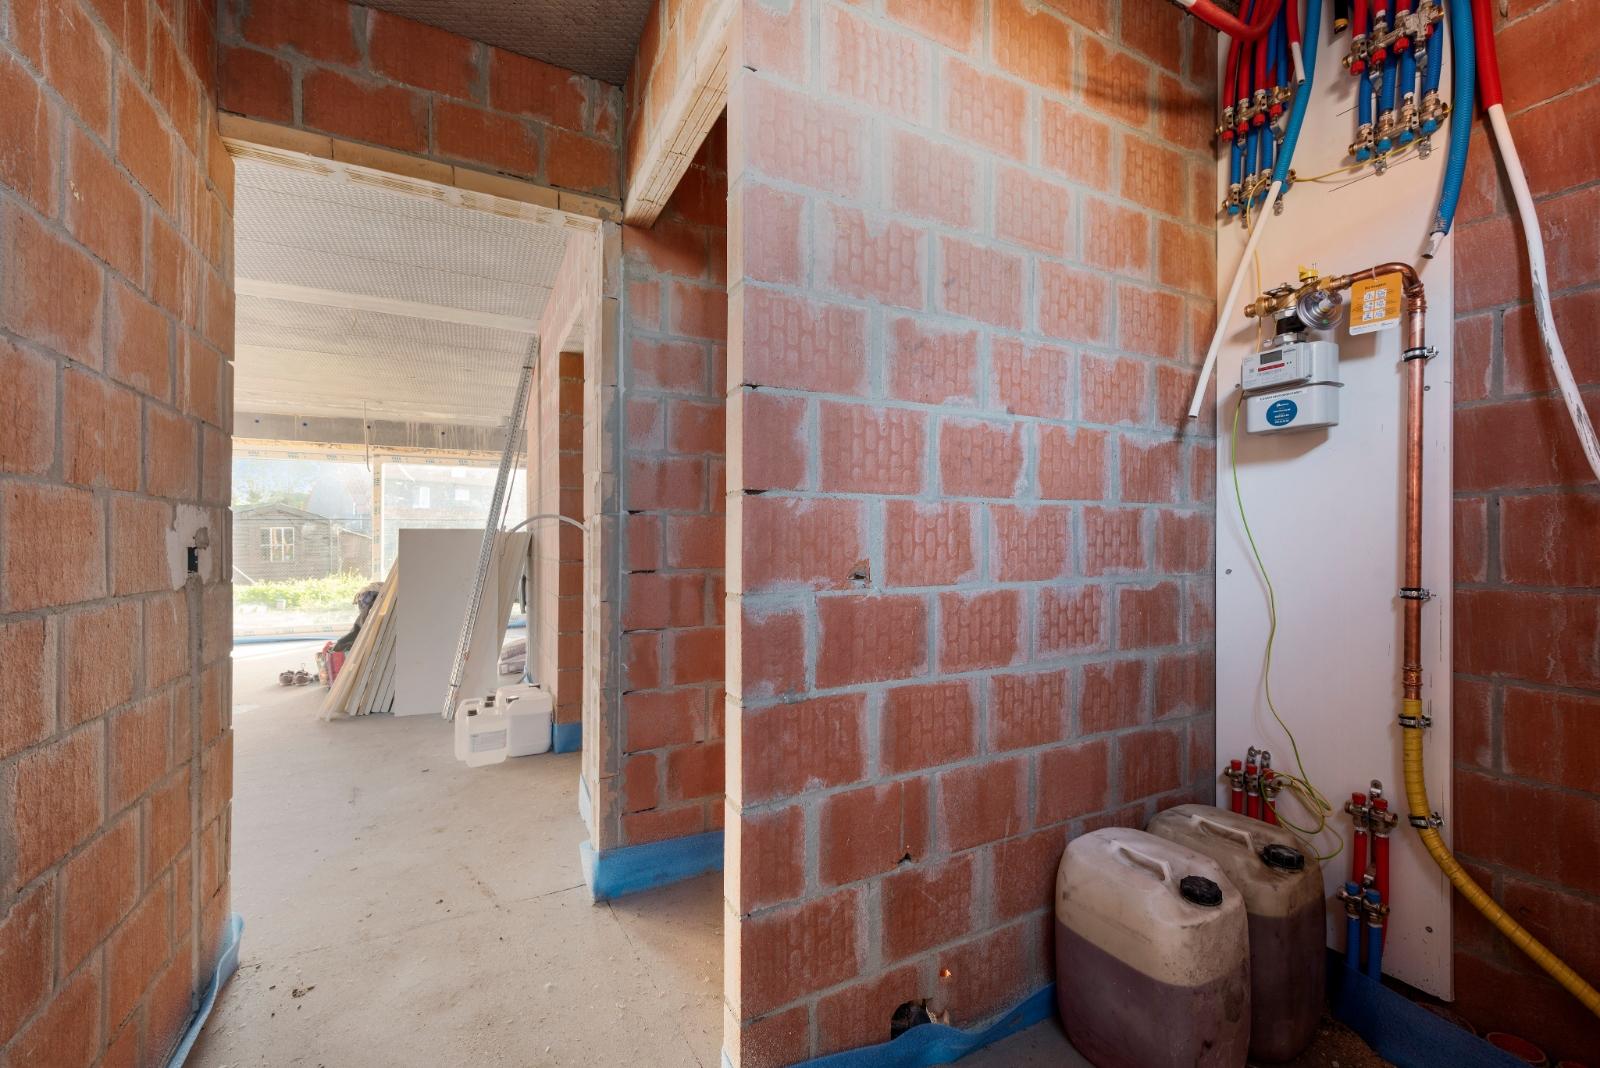 Kwaliteitsvolle nieuwbouwwoning in centrum Leke - 2